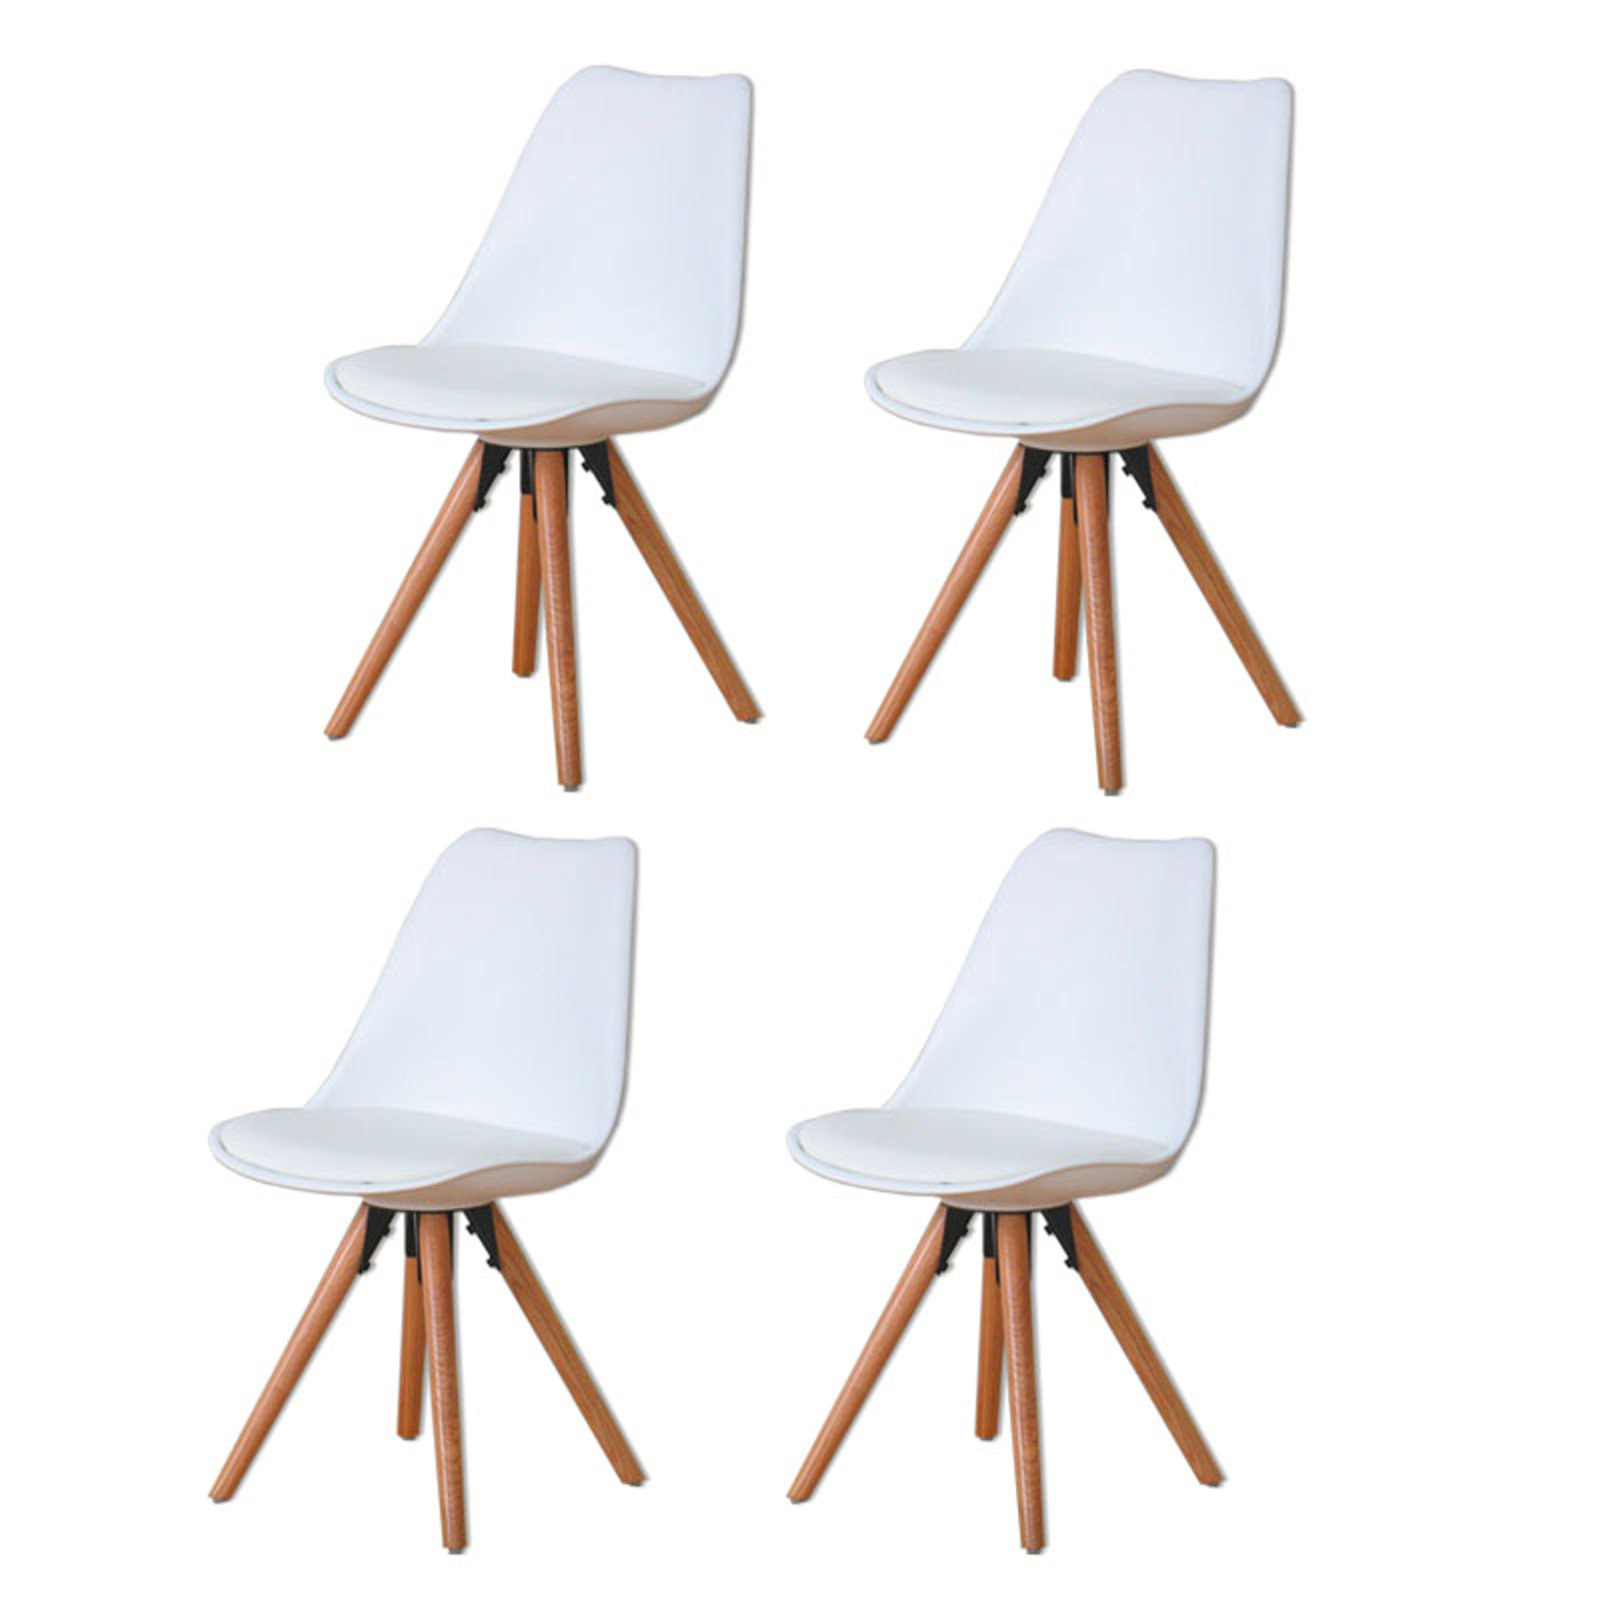 4 x esszimmerst hle nelle retro stuhl sitz gruppe wei. Black Bedroom Furniture Sets. Home Design Ideas